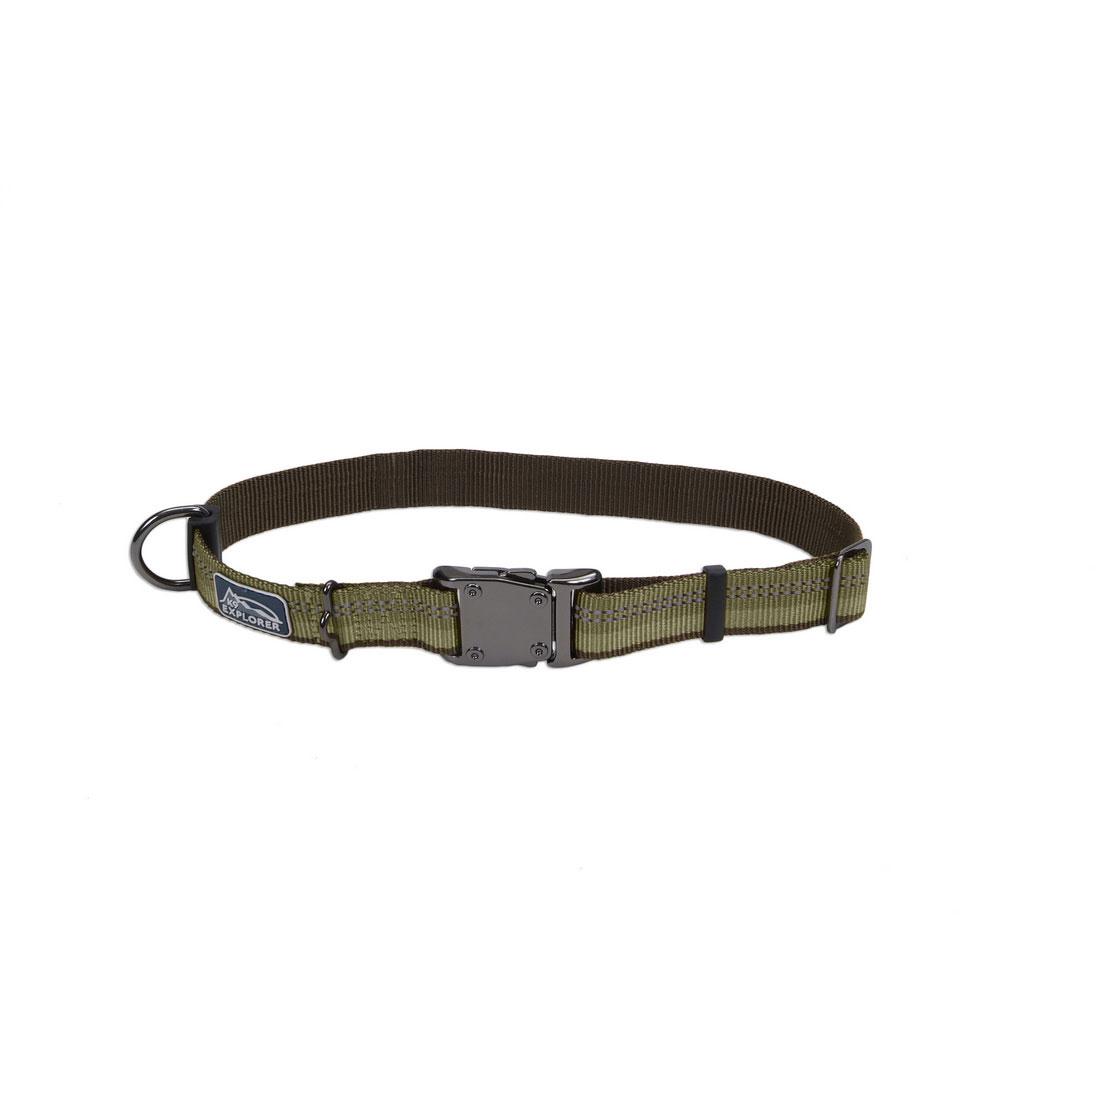 K9 Explorer Reflective Adjustable Dog Collar, Green, 1-inx18-26-in